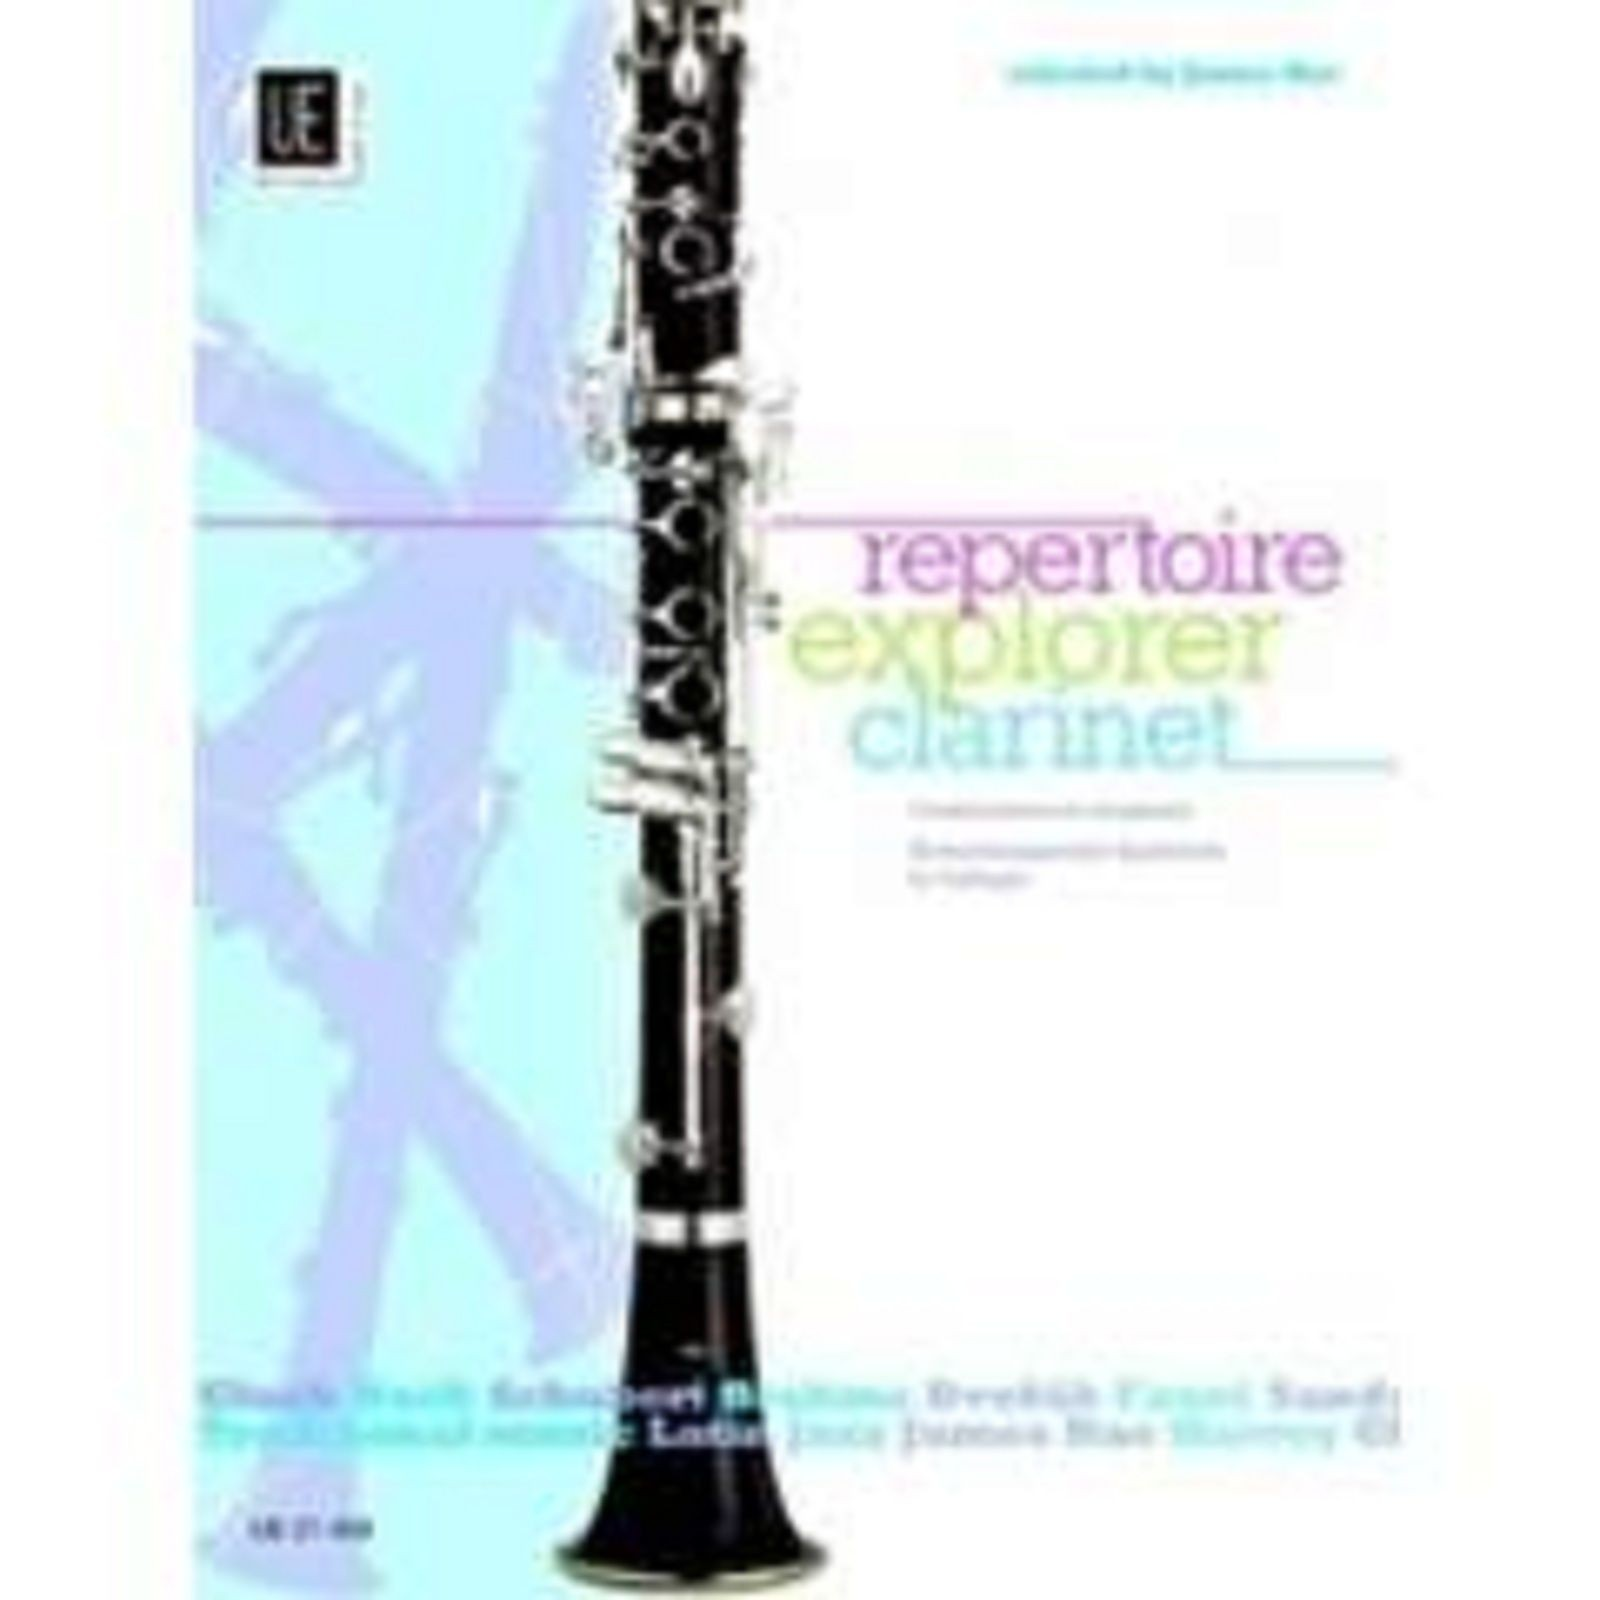 Repertoire Explorer Clarinet James Rae Sheet Music Book Grade 1-3 Pieces S83